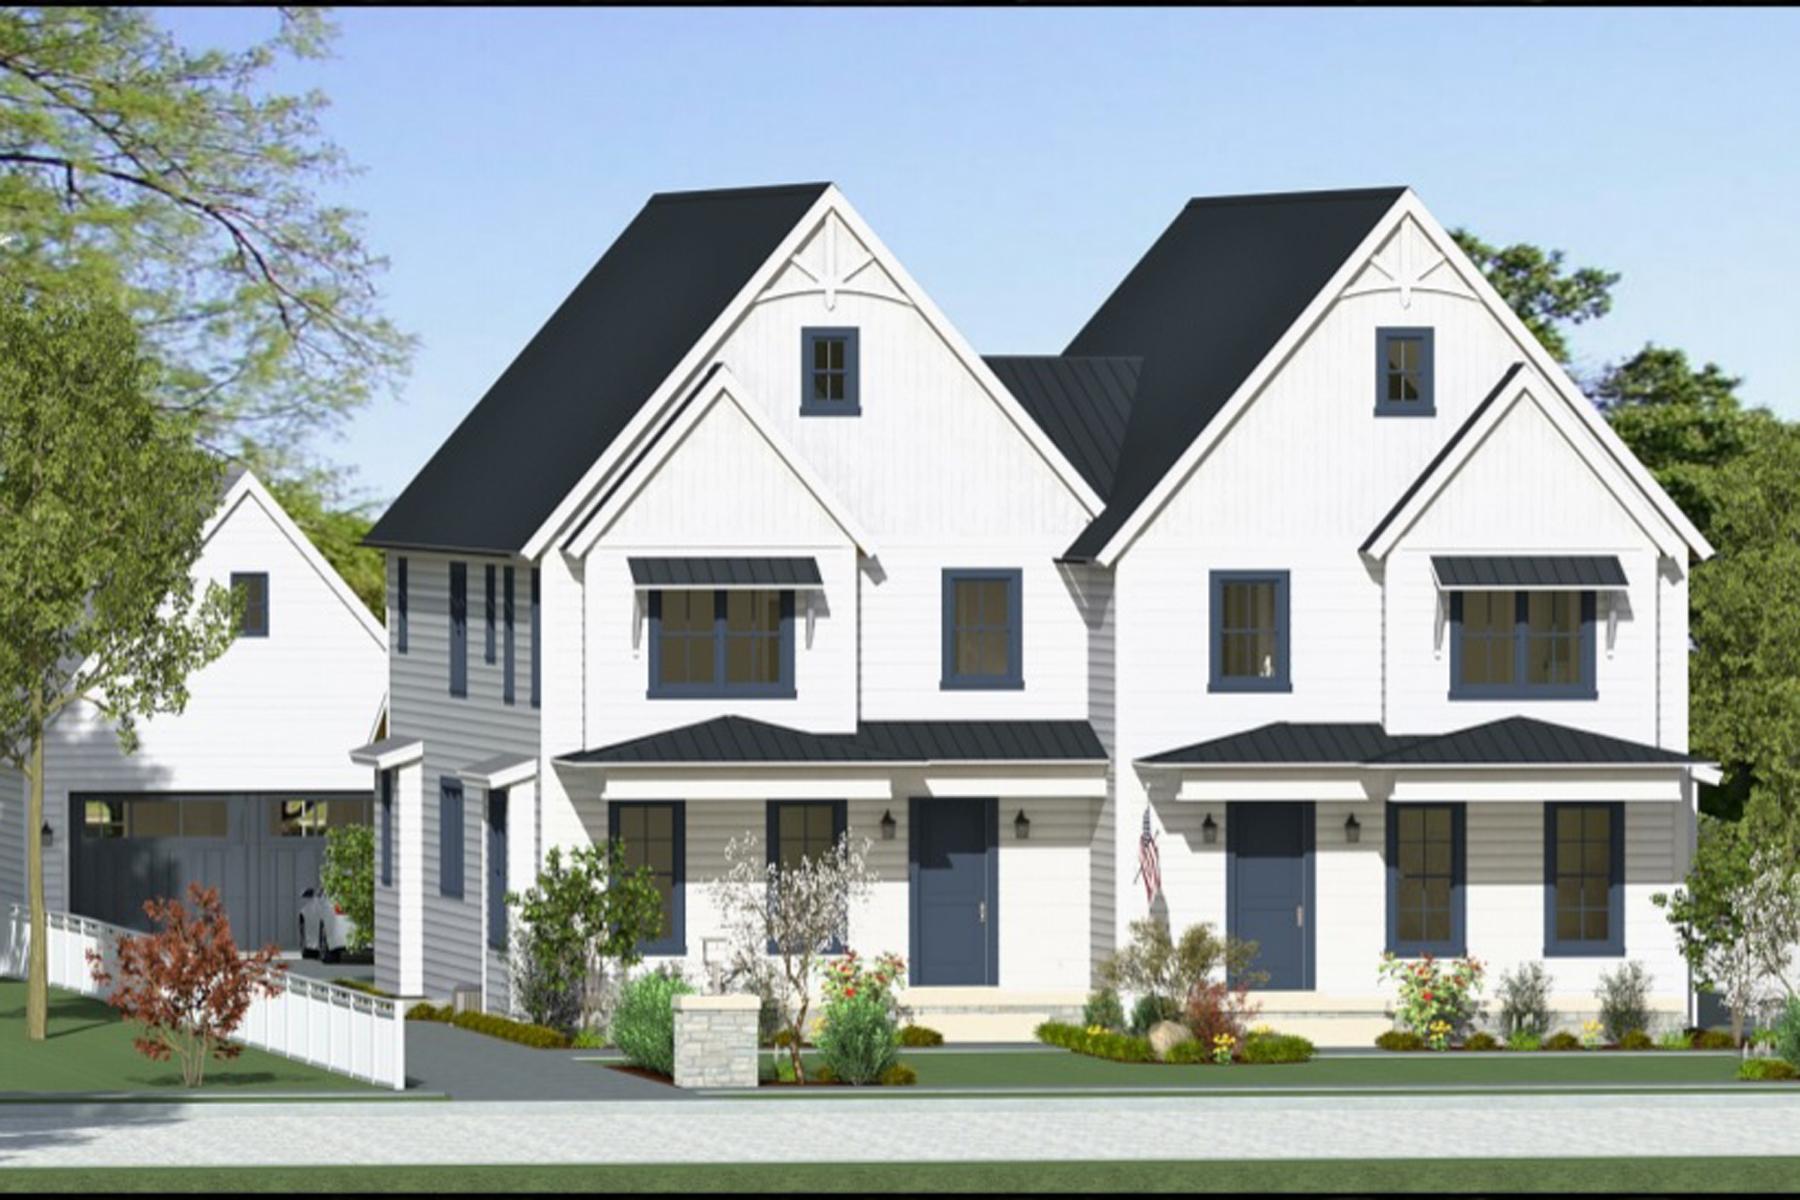 Single Family Homes for Sale at Birmingham 885 Redding Road Birmingham, Michigan 48009 United States